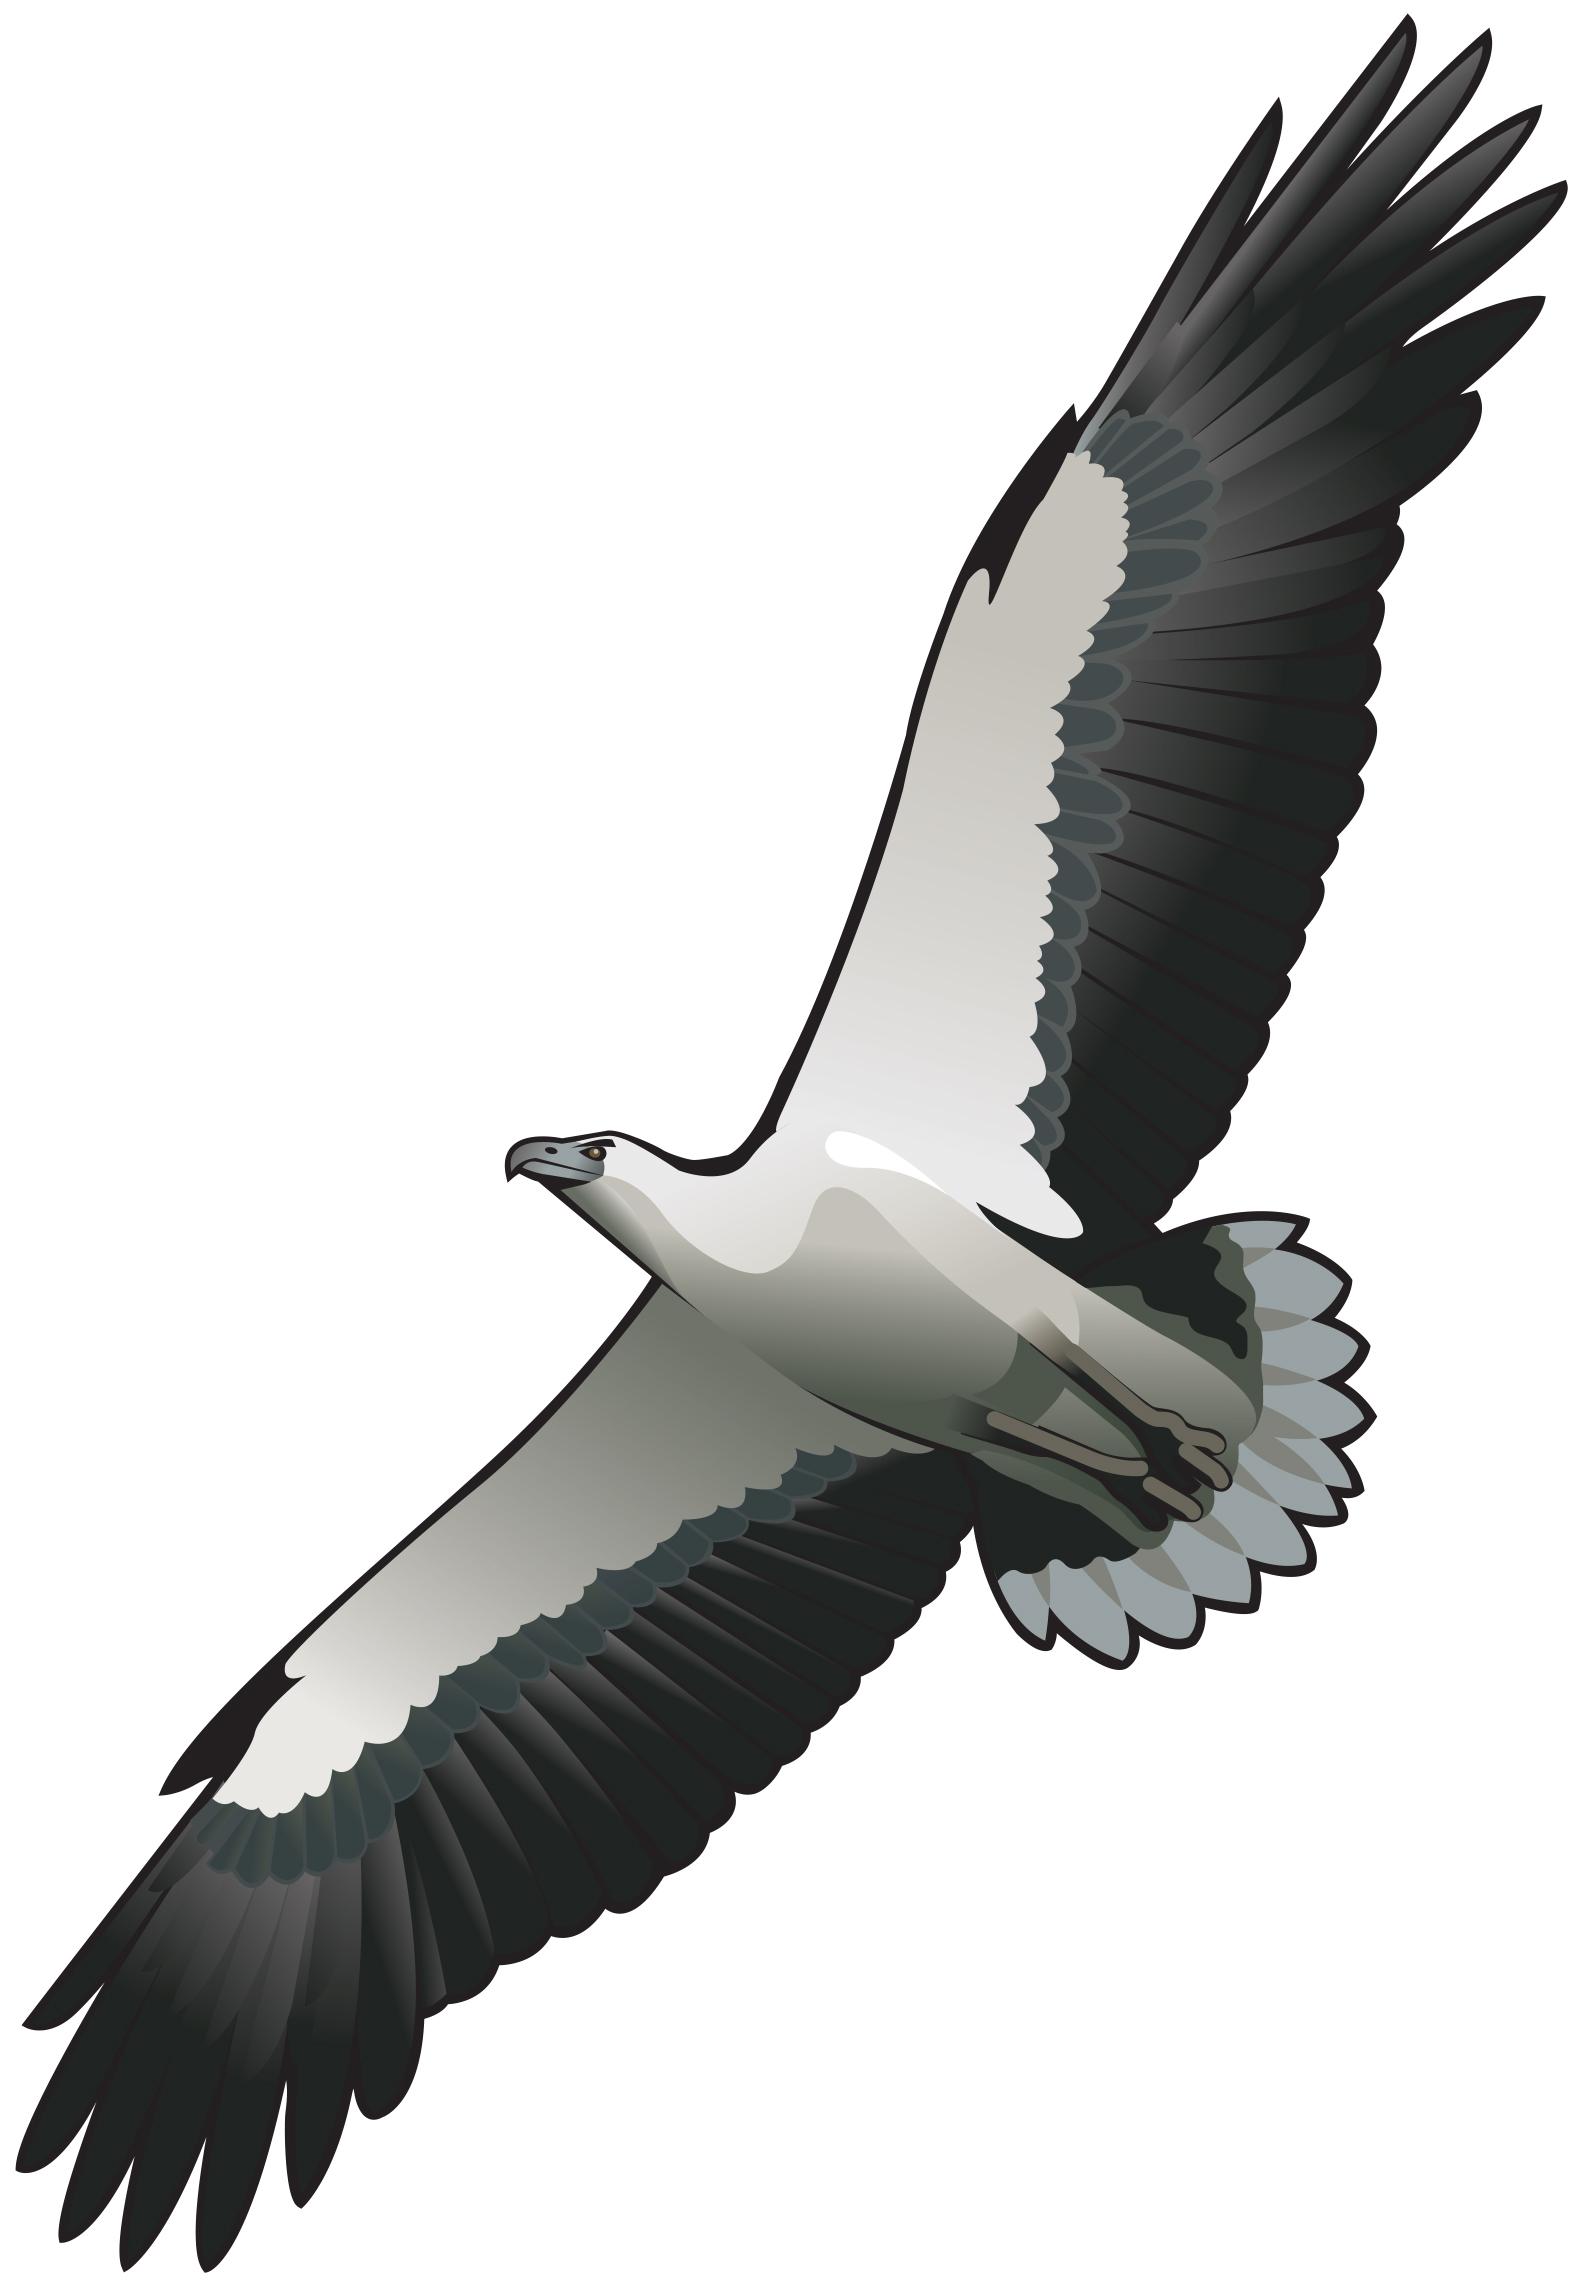 http://www.thalabeach.com.au/wp-content/uploads/2014/11/TBNR-Sea-eagle.jpg